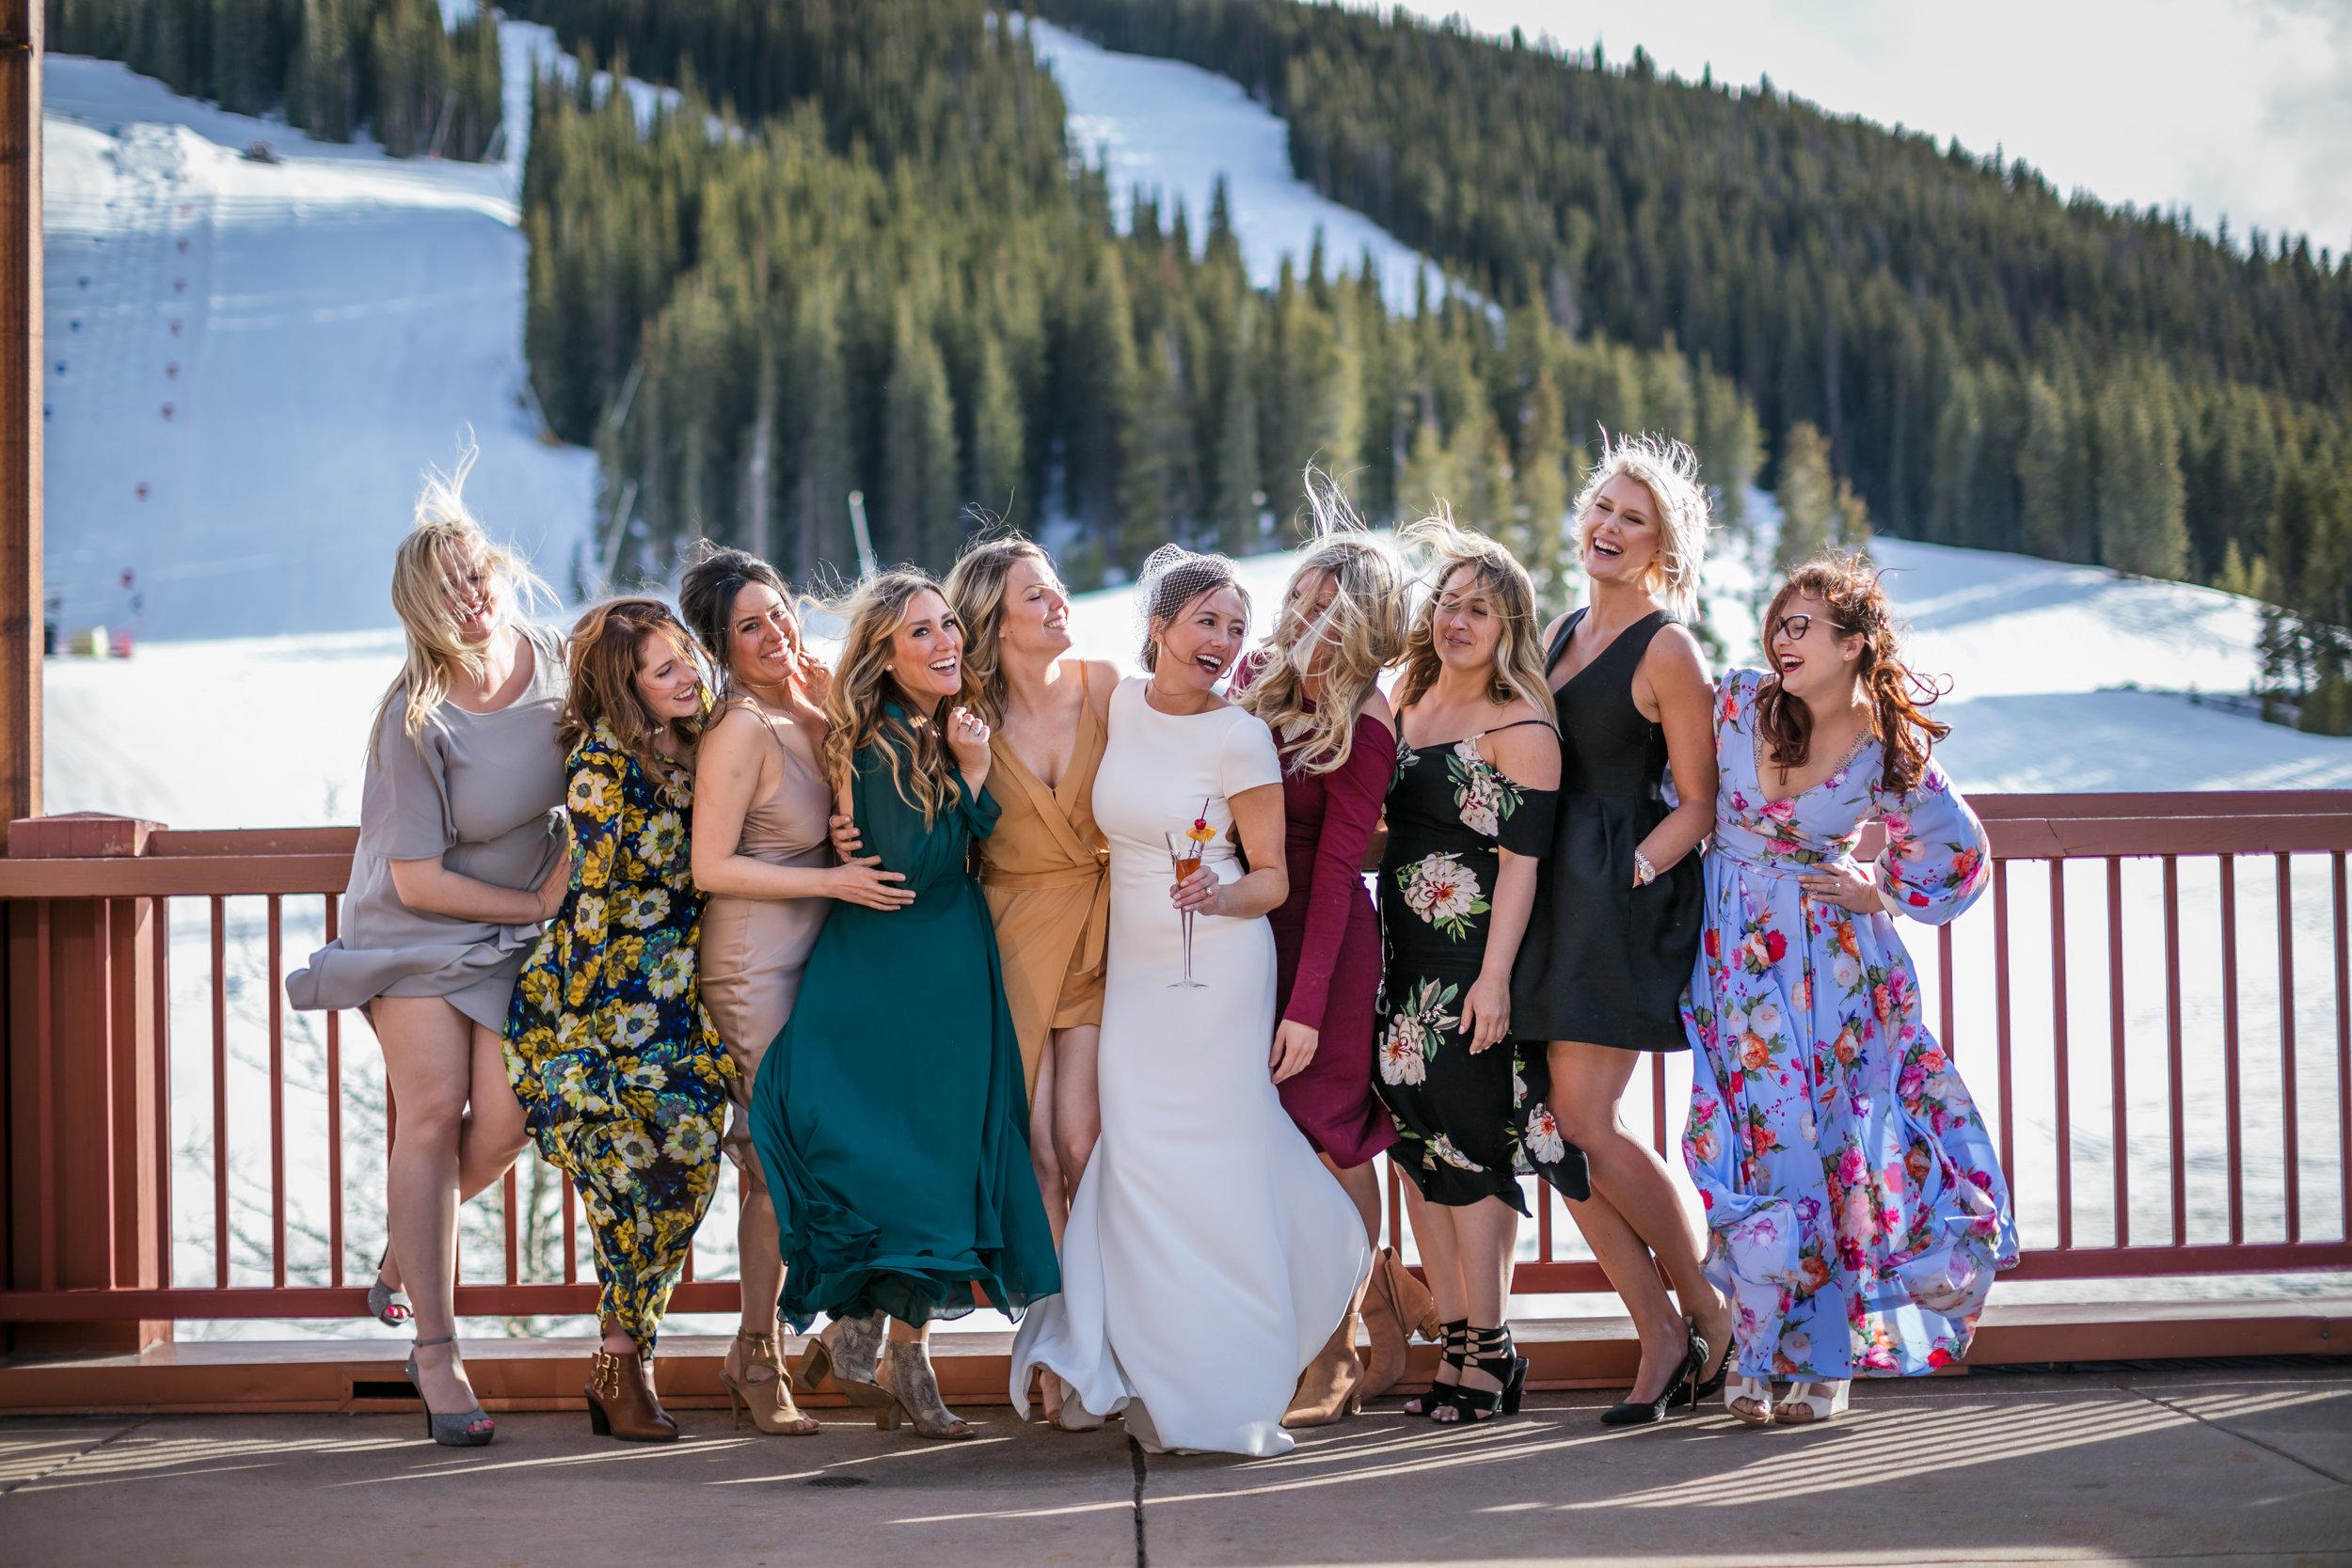 vild-photography-photographer-colorado-intimate-wedding-adventure-Stephanie- Adam-519.jpg